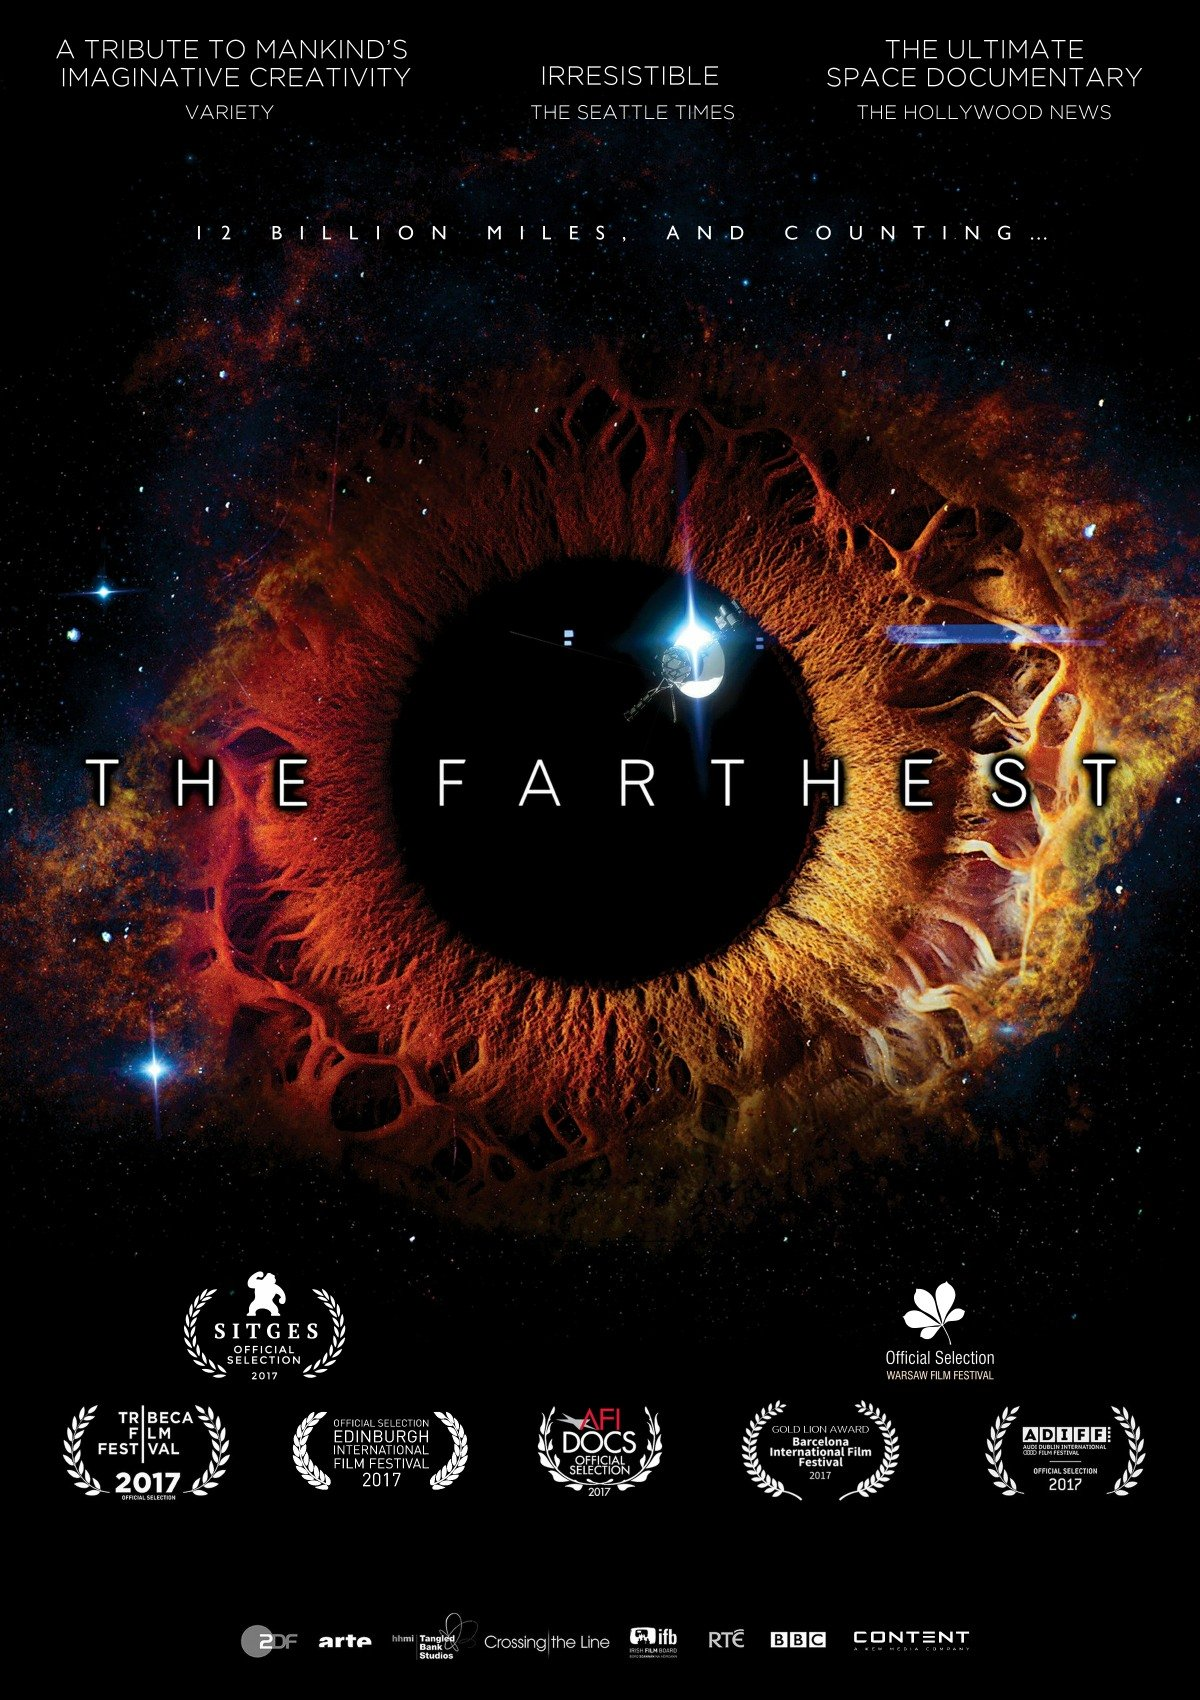 The.Farthest.2017.LIMITED.720p.BluRay.x264-CADAVER